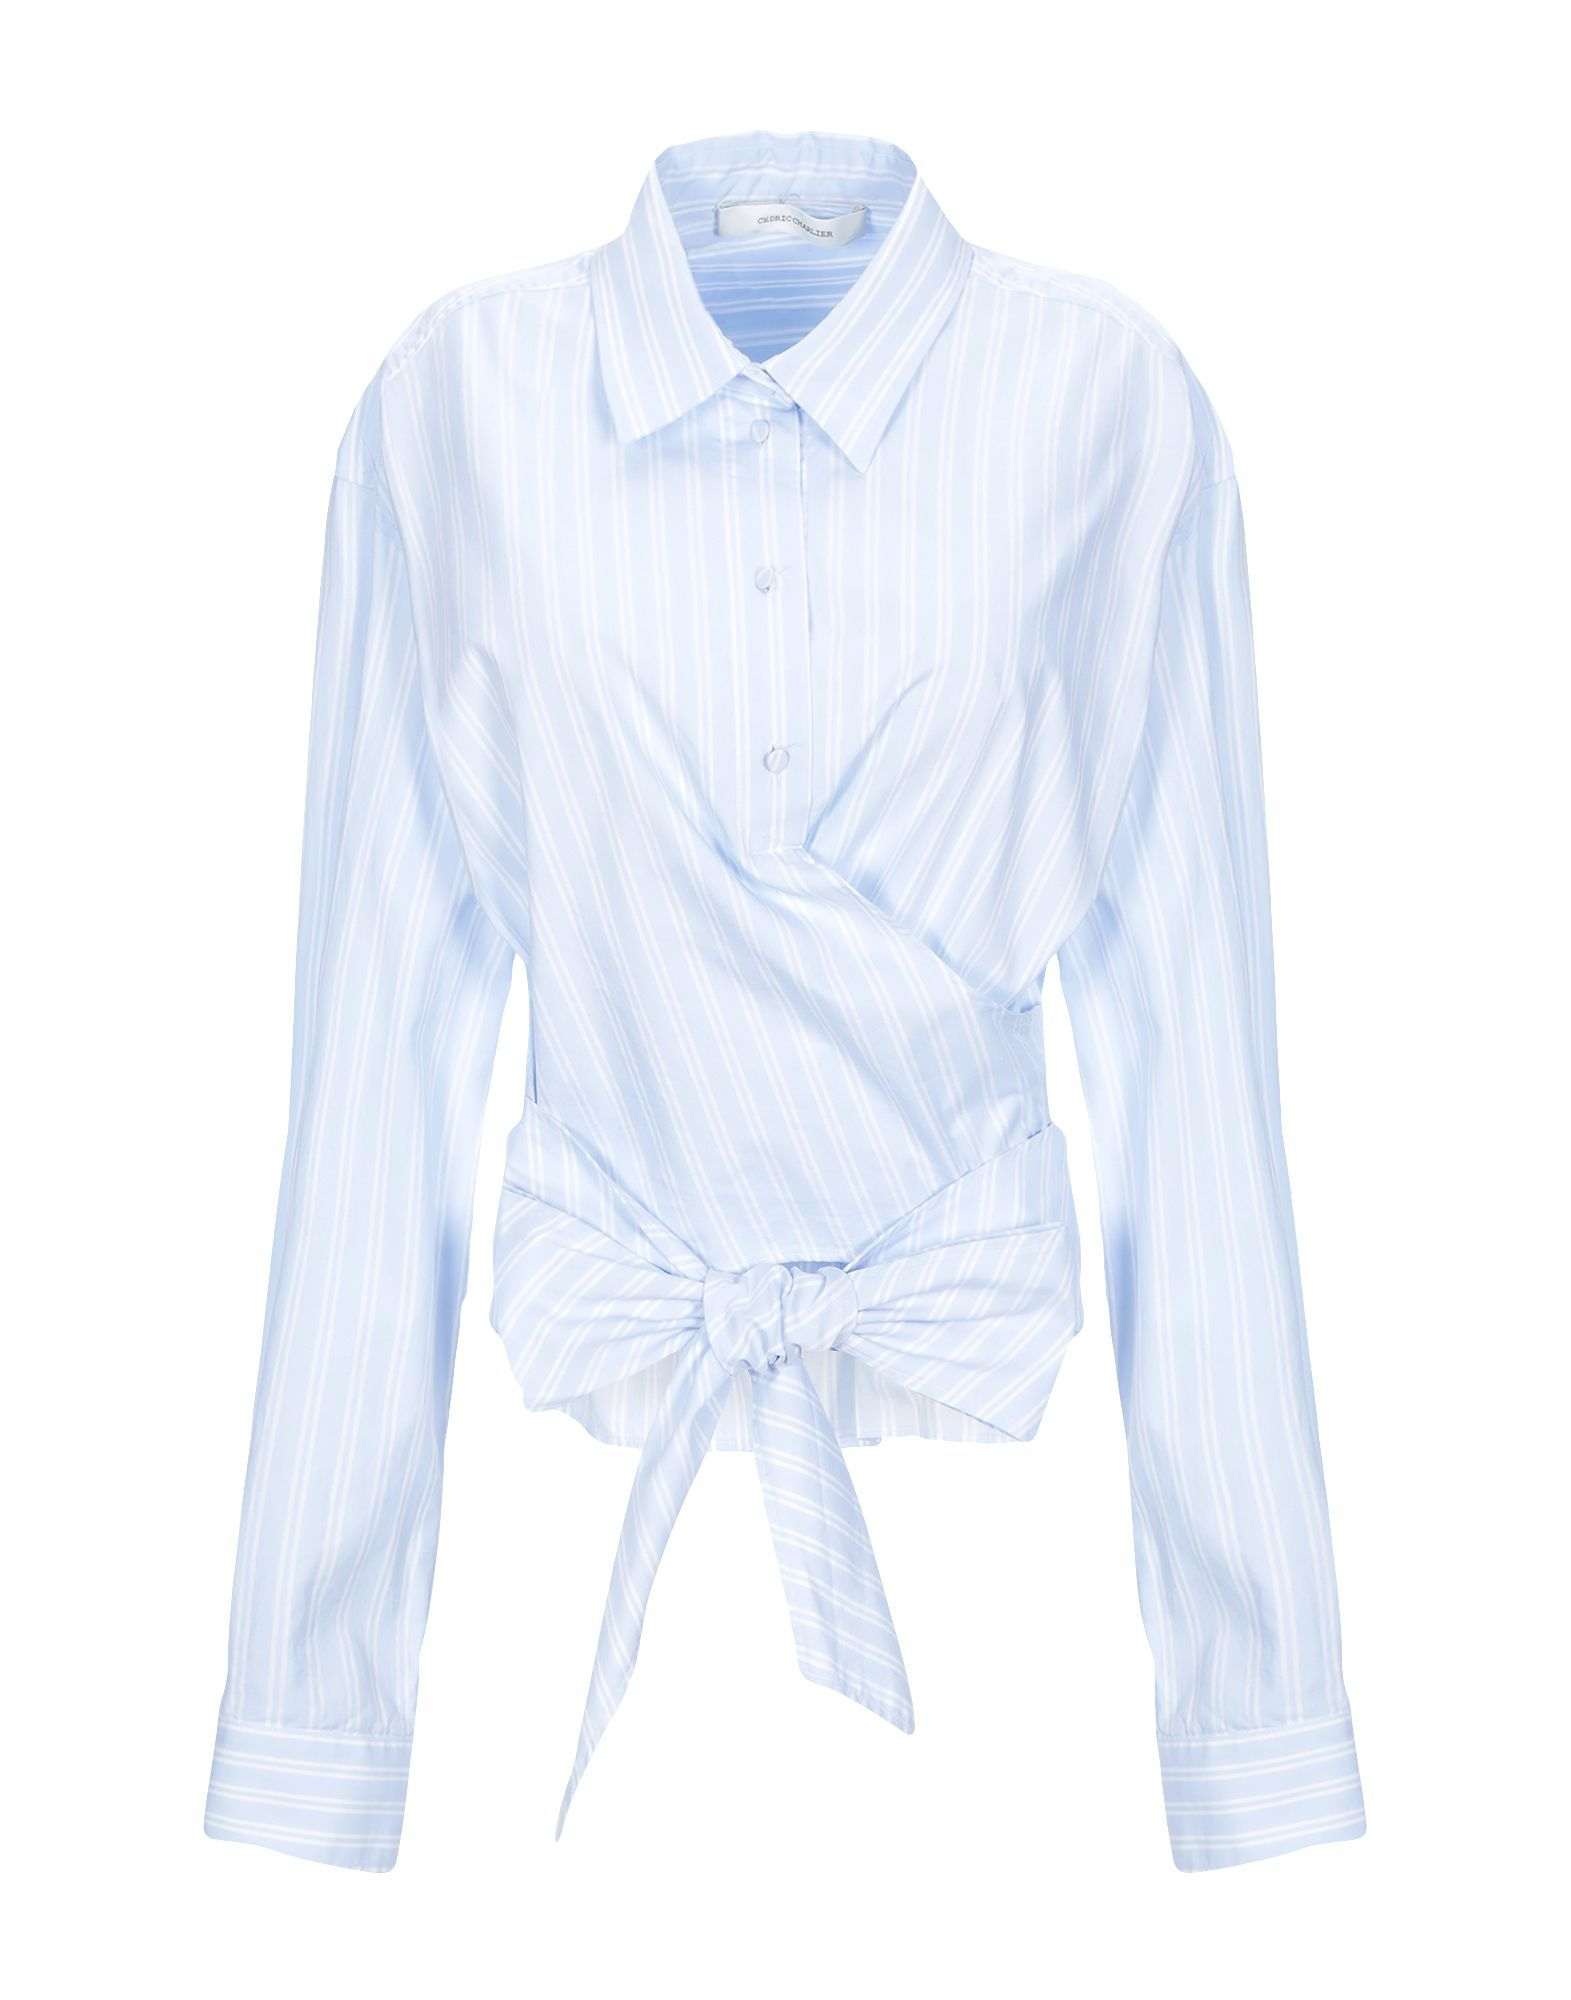 Cedric Charlier Women's Shirts Cotton